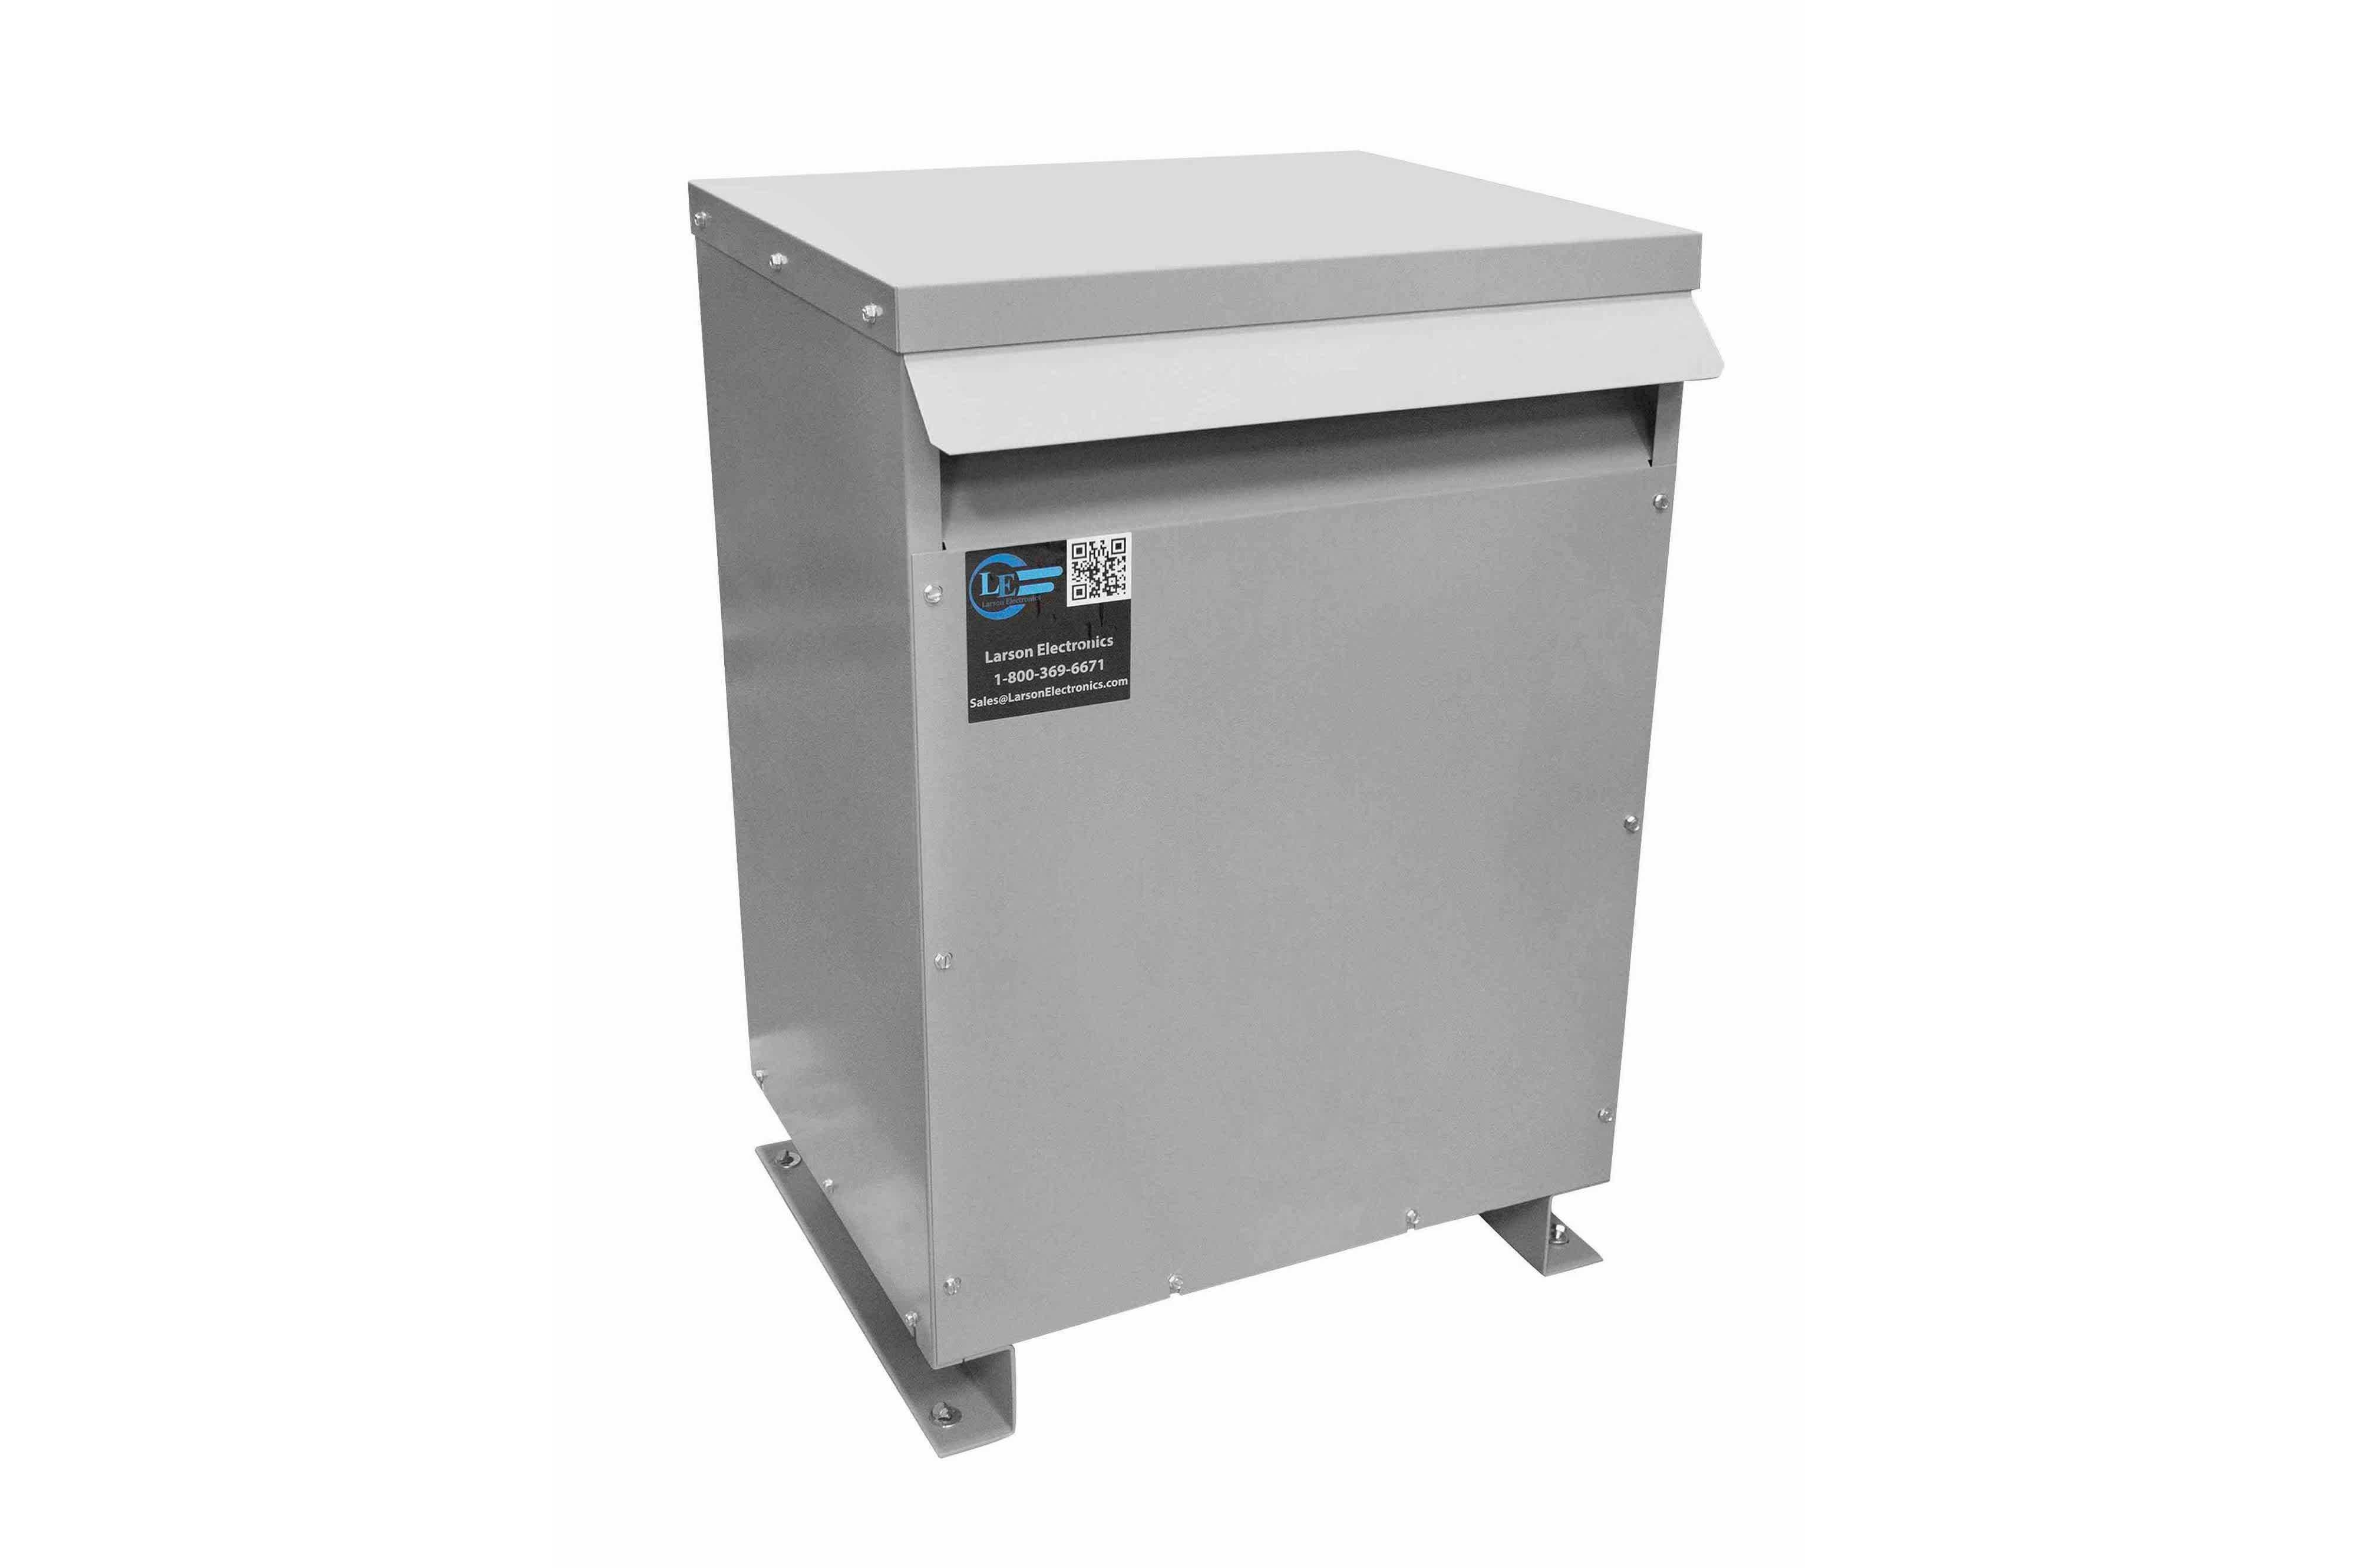 36 kVA 3PH Isolation Transformer, 380V Wye Primary, 480V Delta Secondary, N3R, Ventilated, 60 Hz